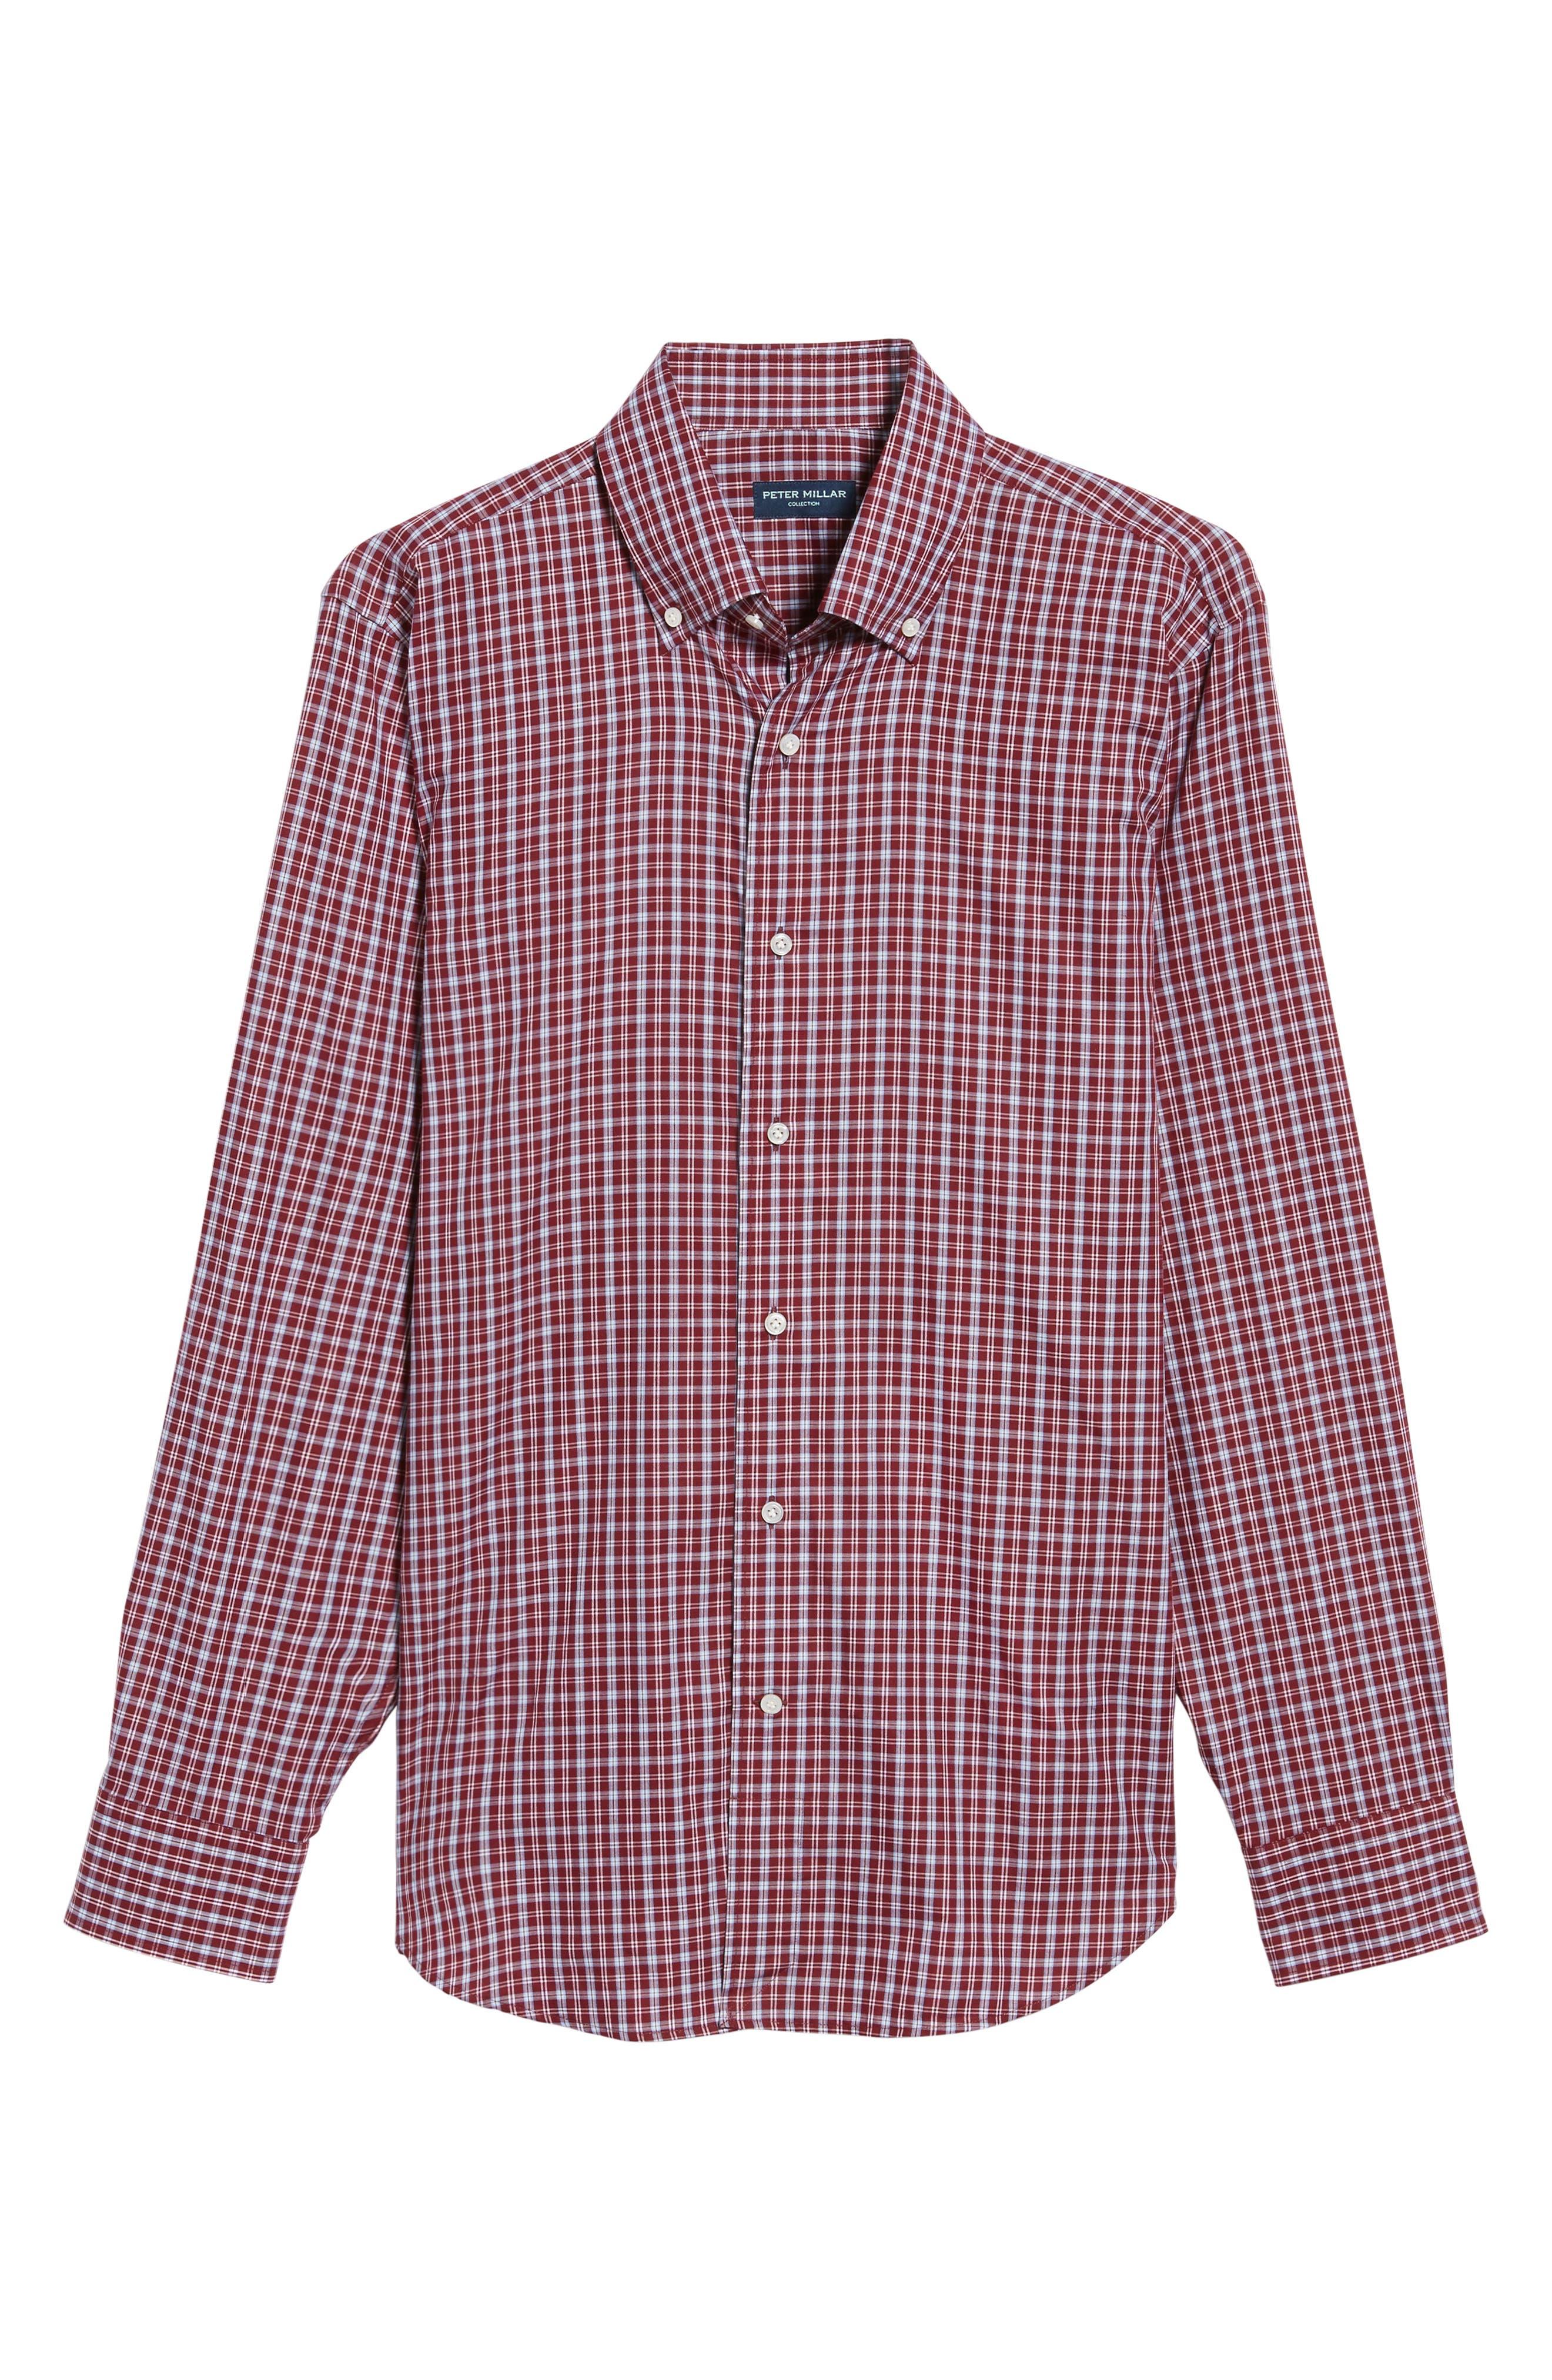 Peter Millar Isle Check Regular Fit Sport Shirt,                             Alternate thumbnail 6, color,                             930